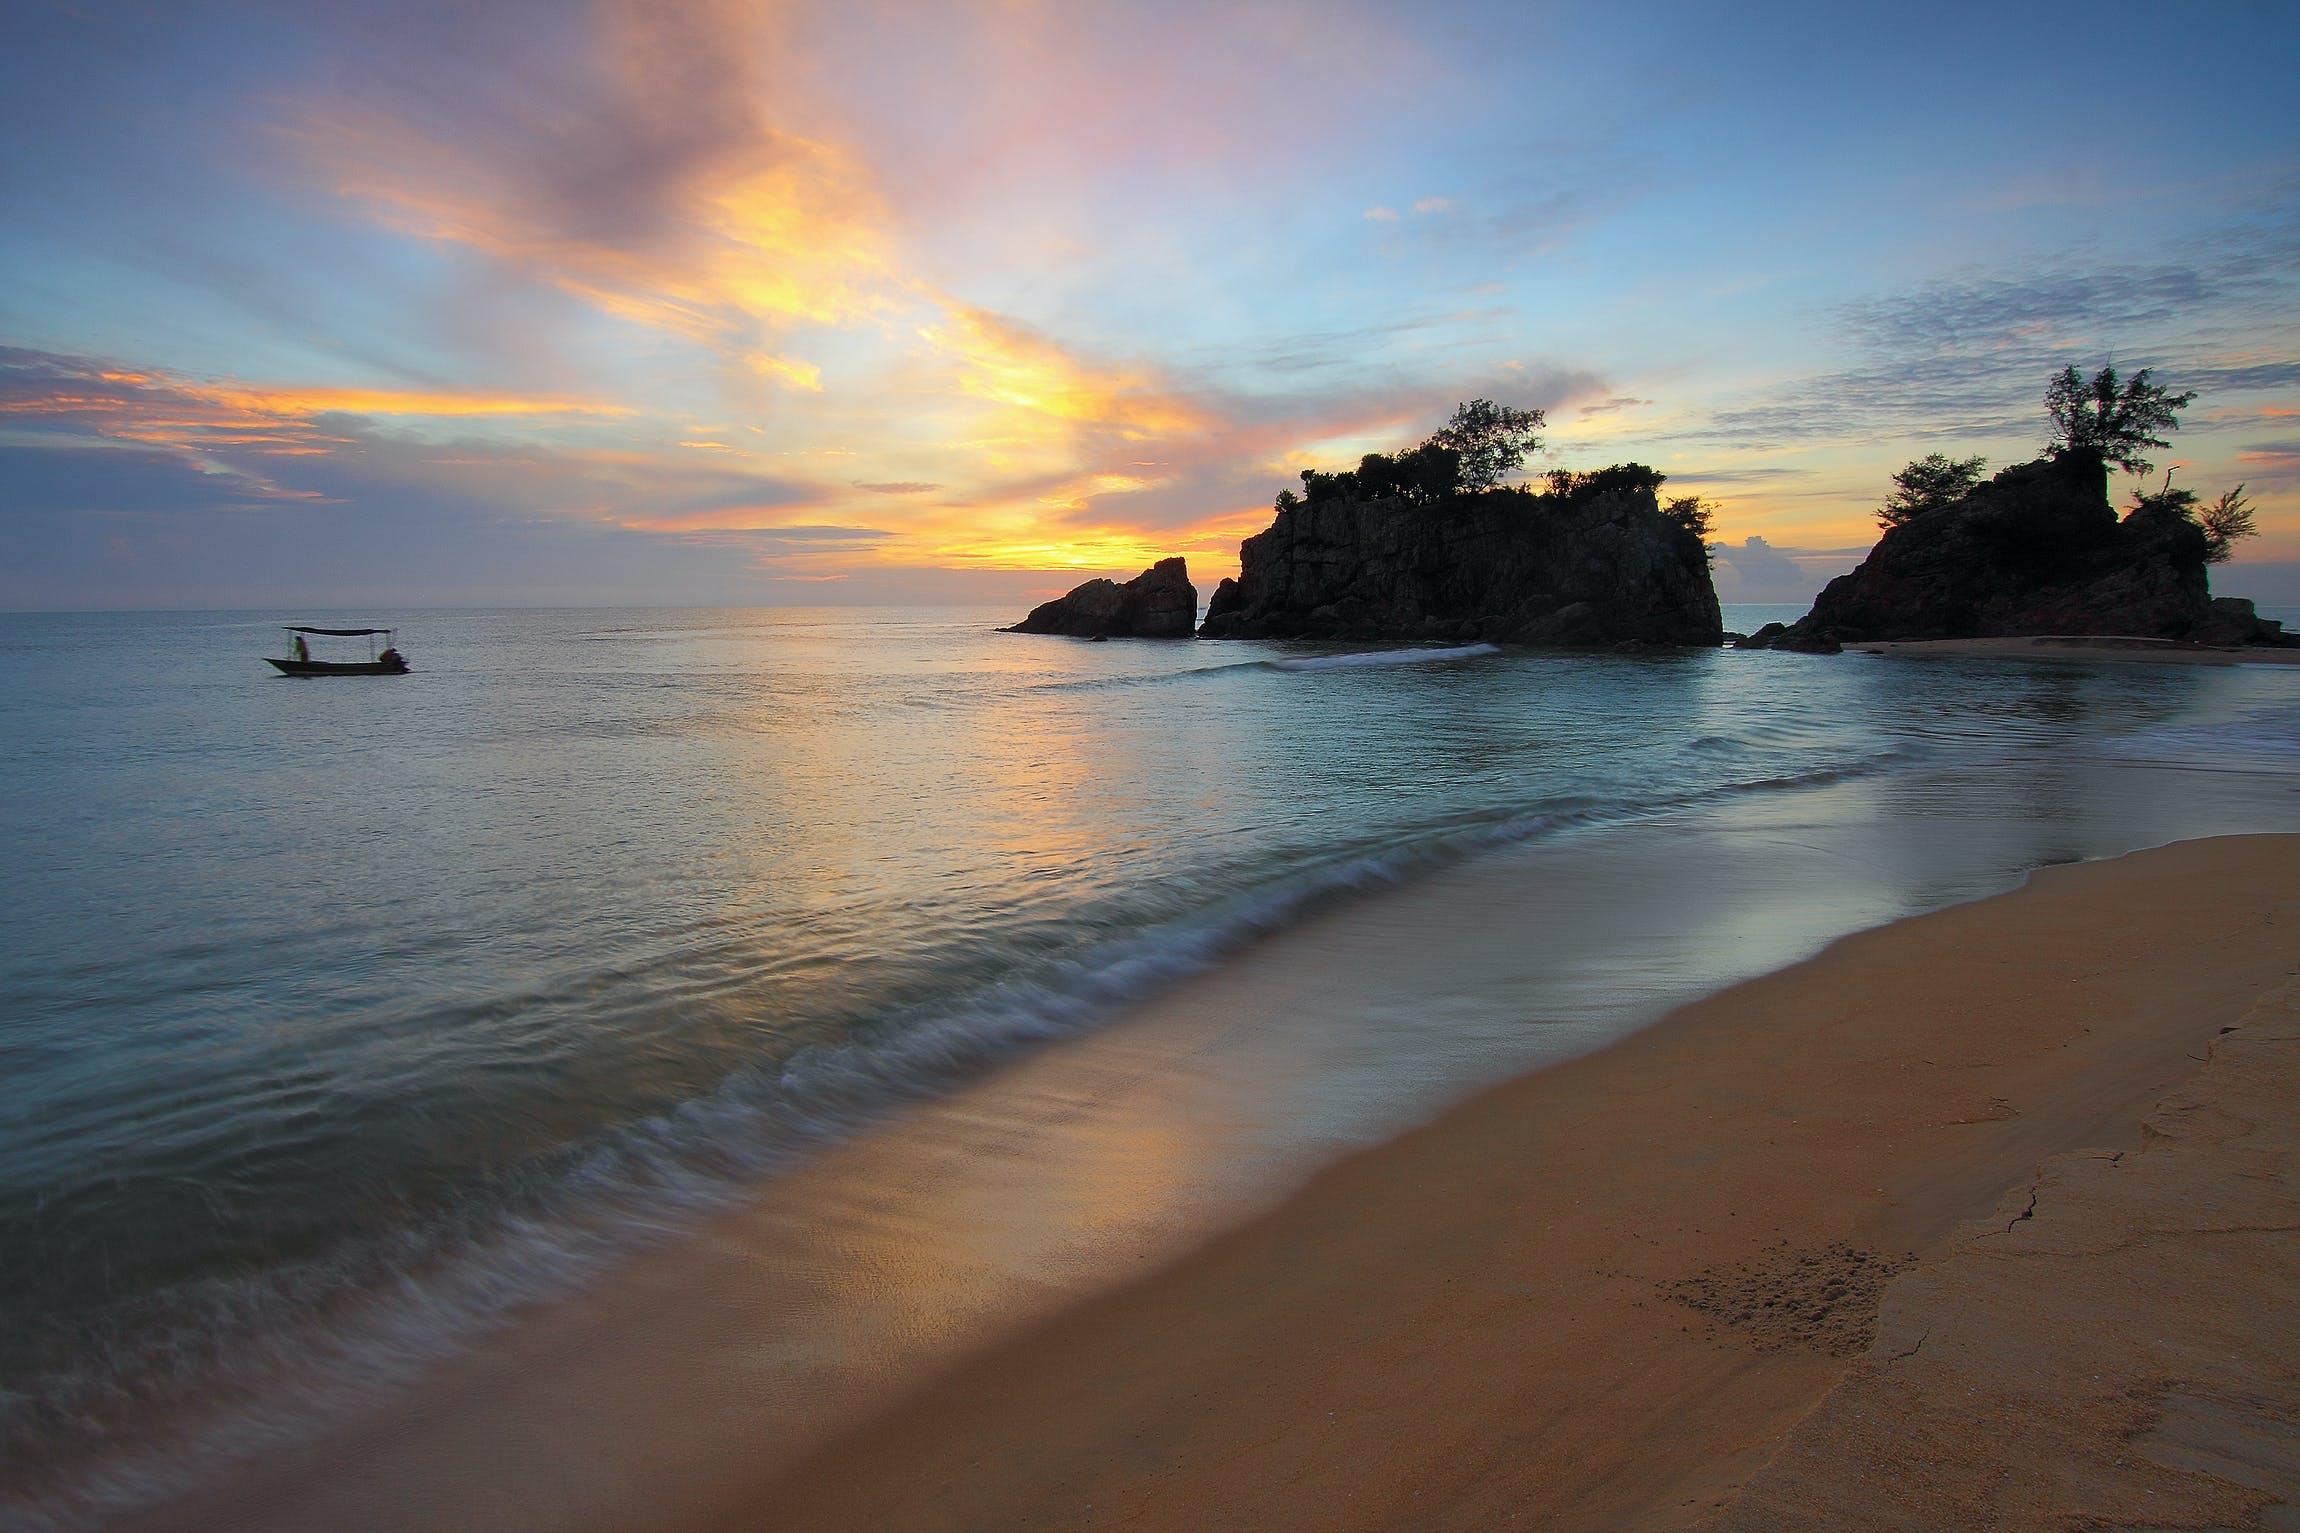 Seashore on Golden Hour Photographyt